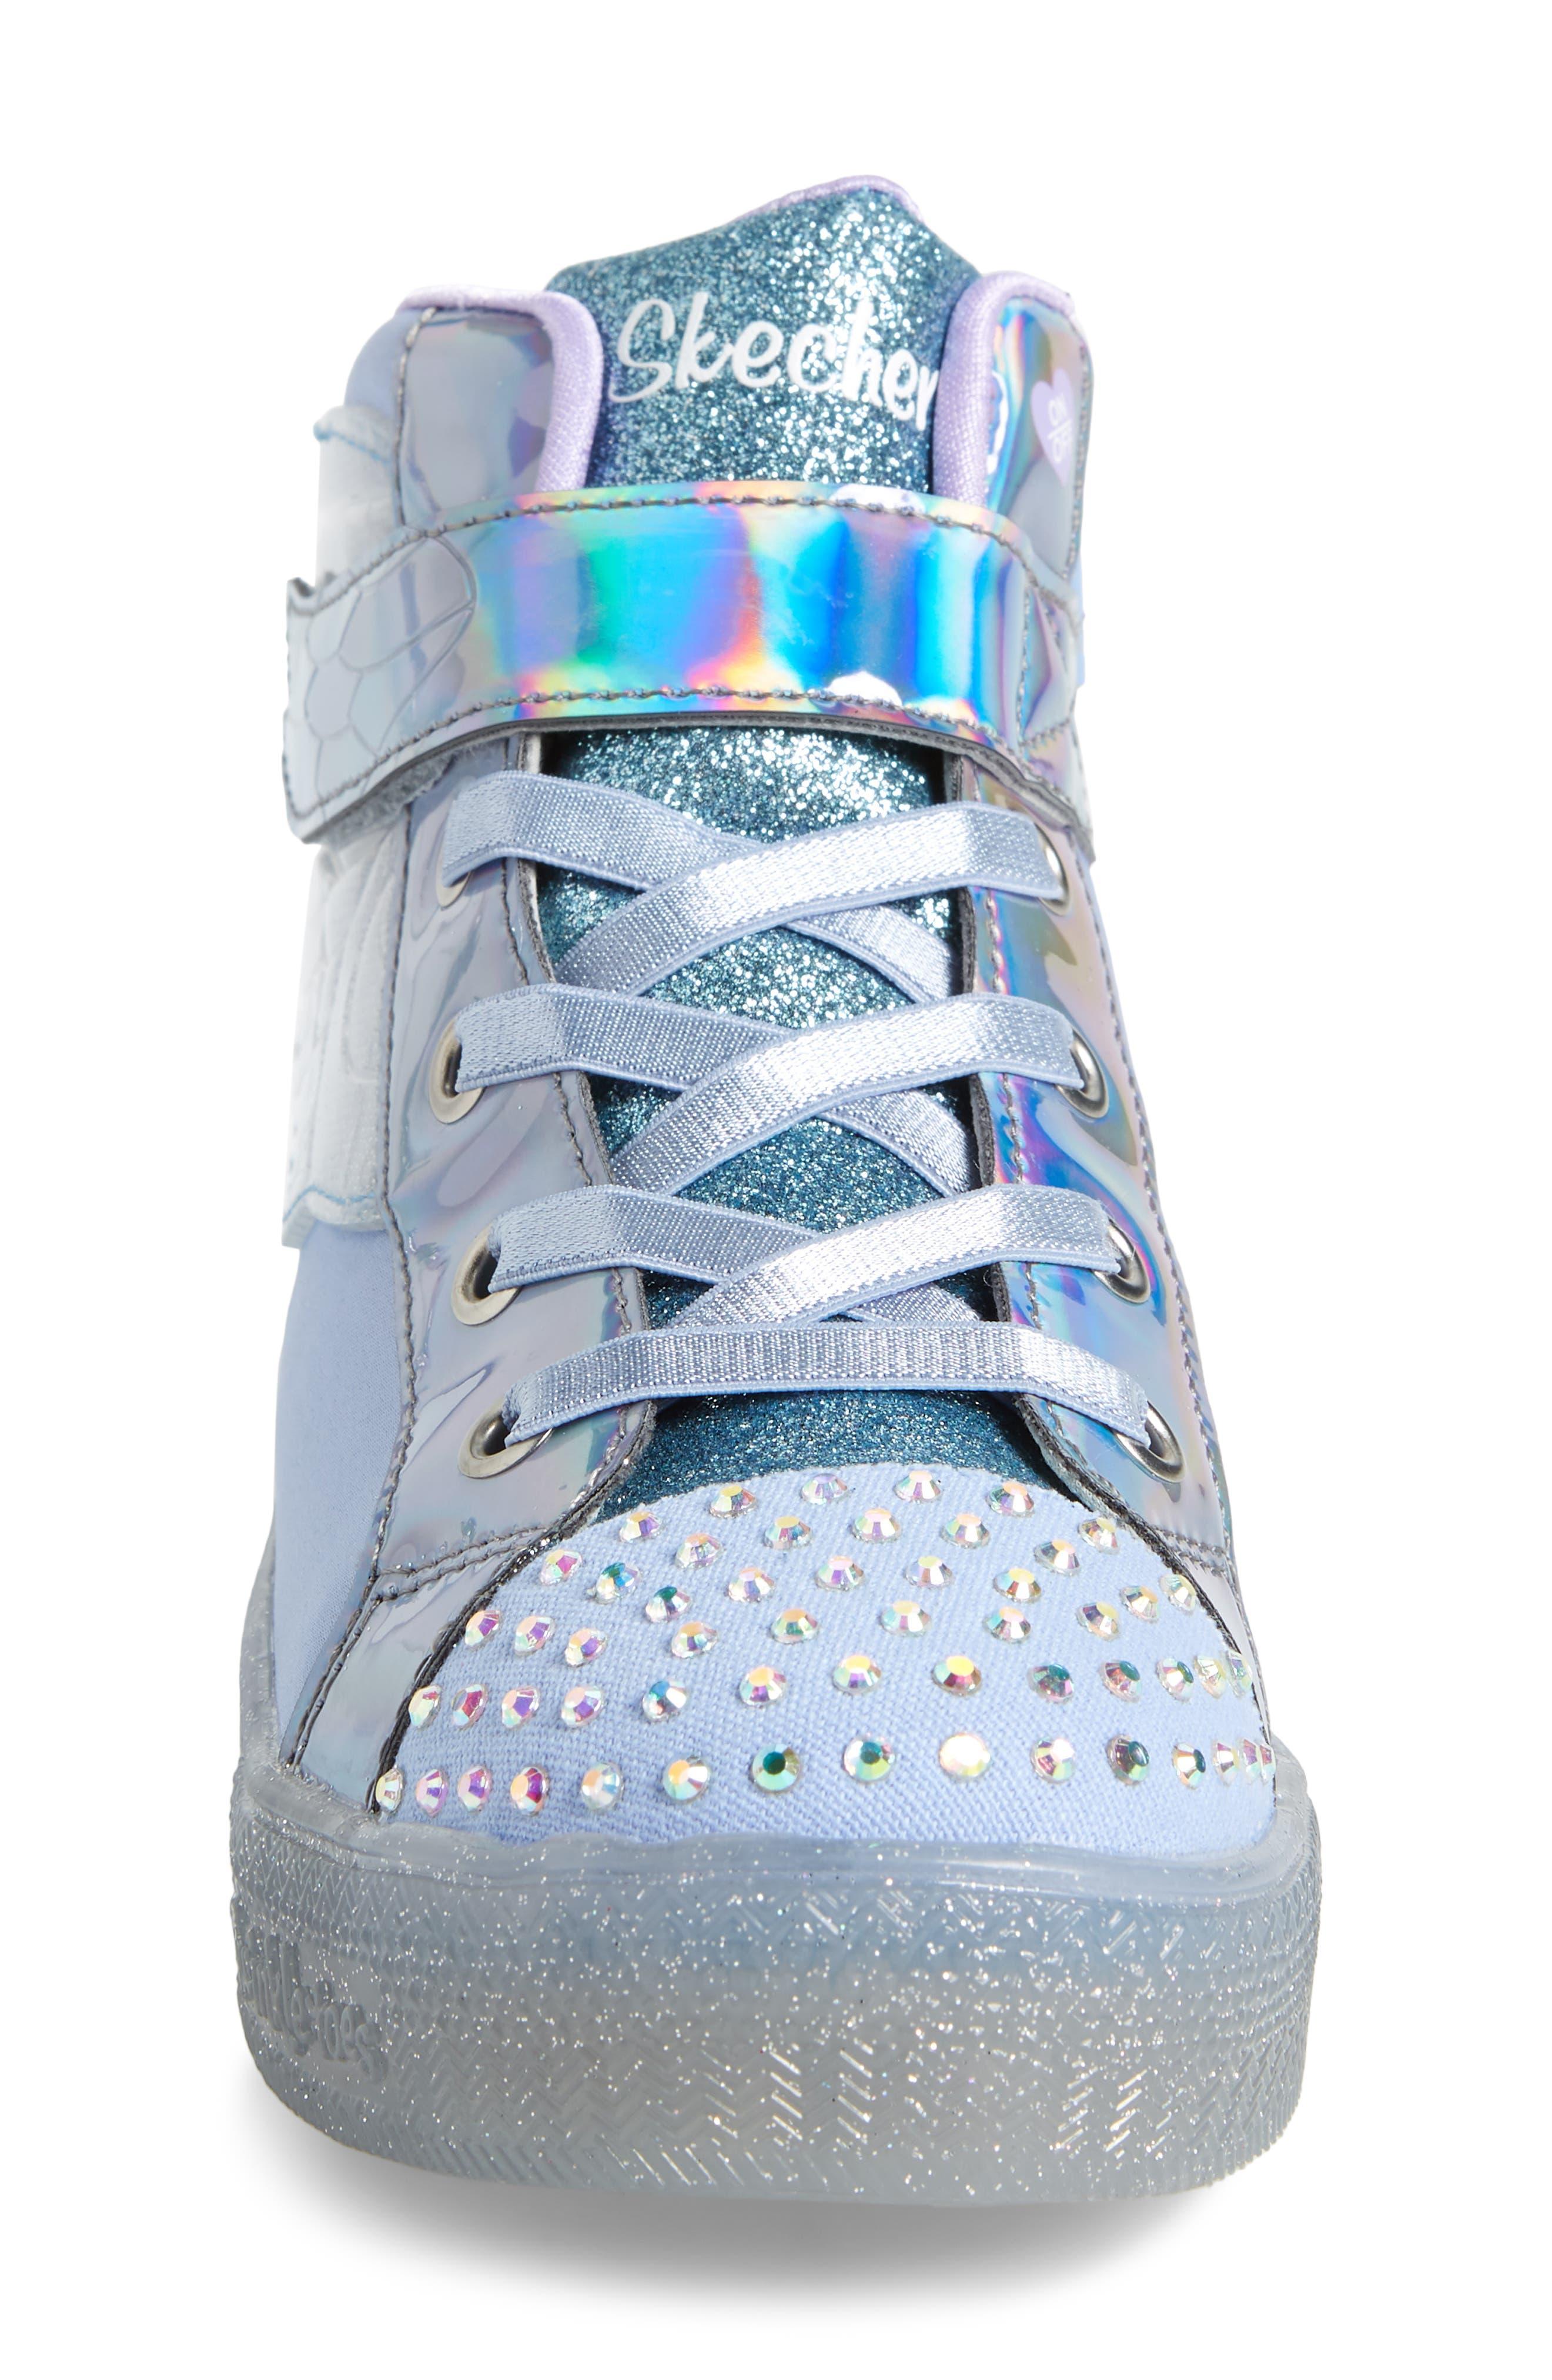 SKECHERS, Twinkle Toes Light-Up Sneaker, Alternate thumbnail 4, color, PERIWINKLE